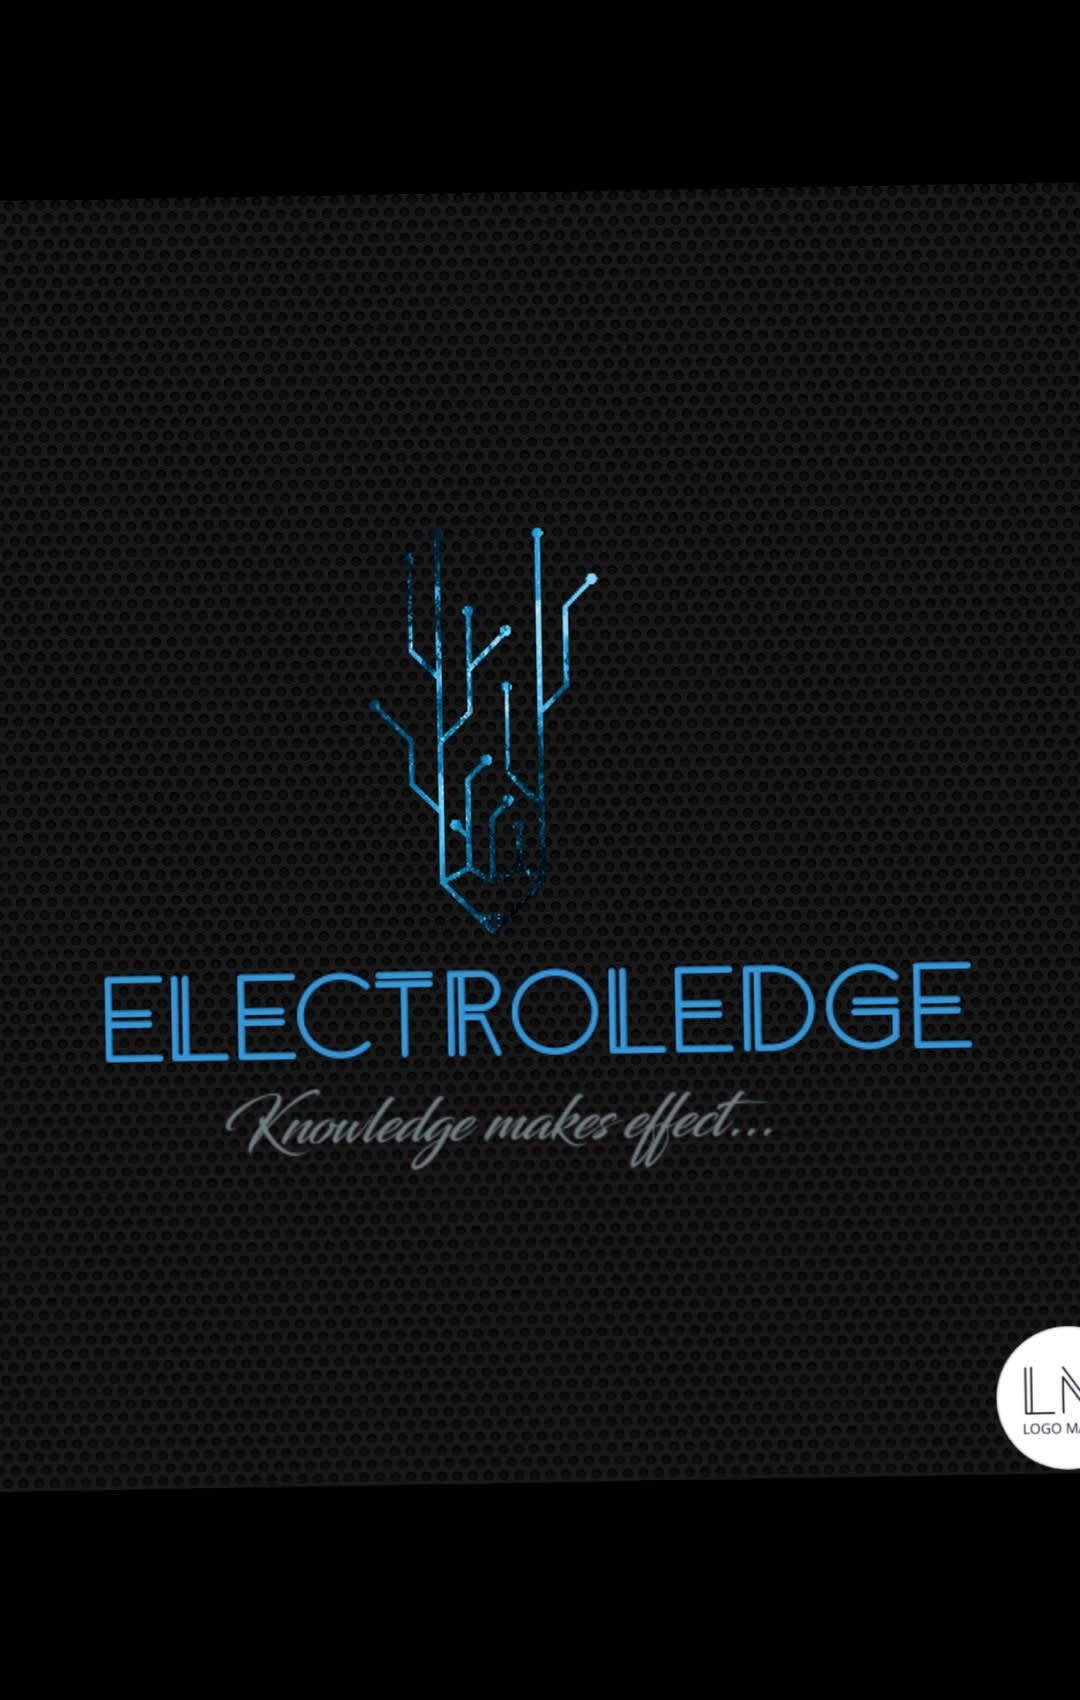 ELECTROLEDGE